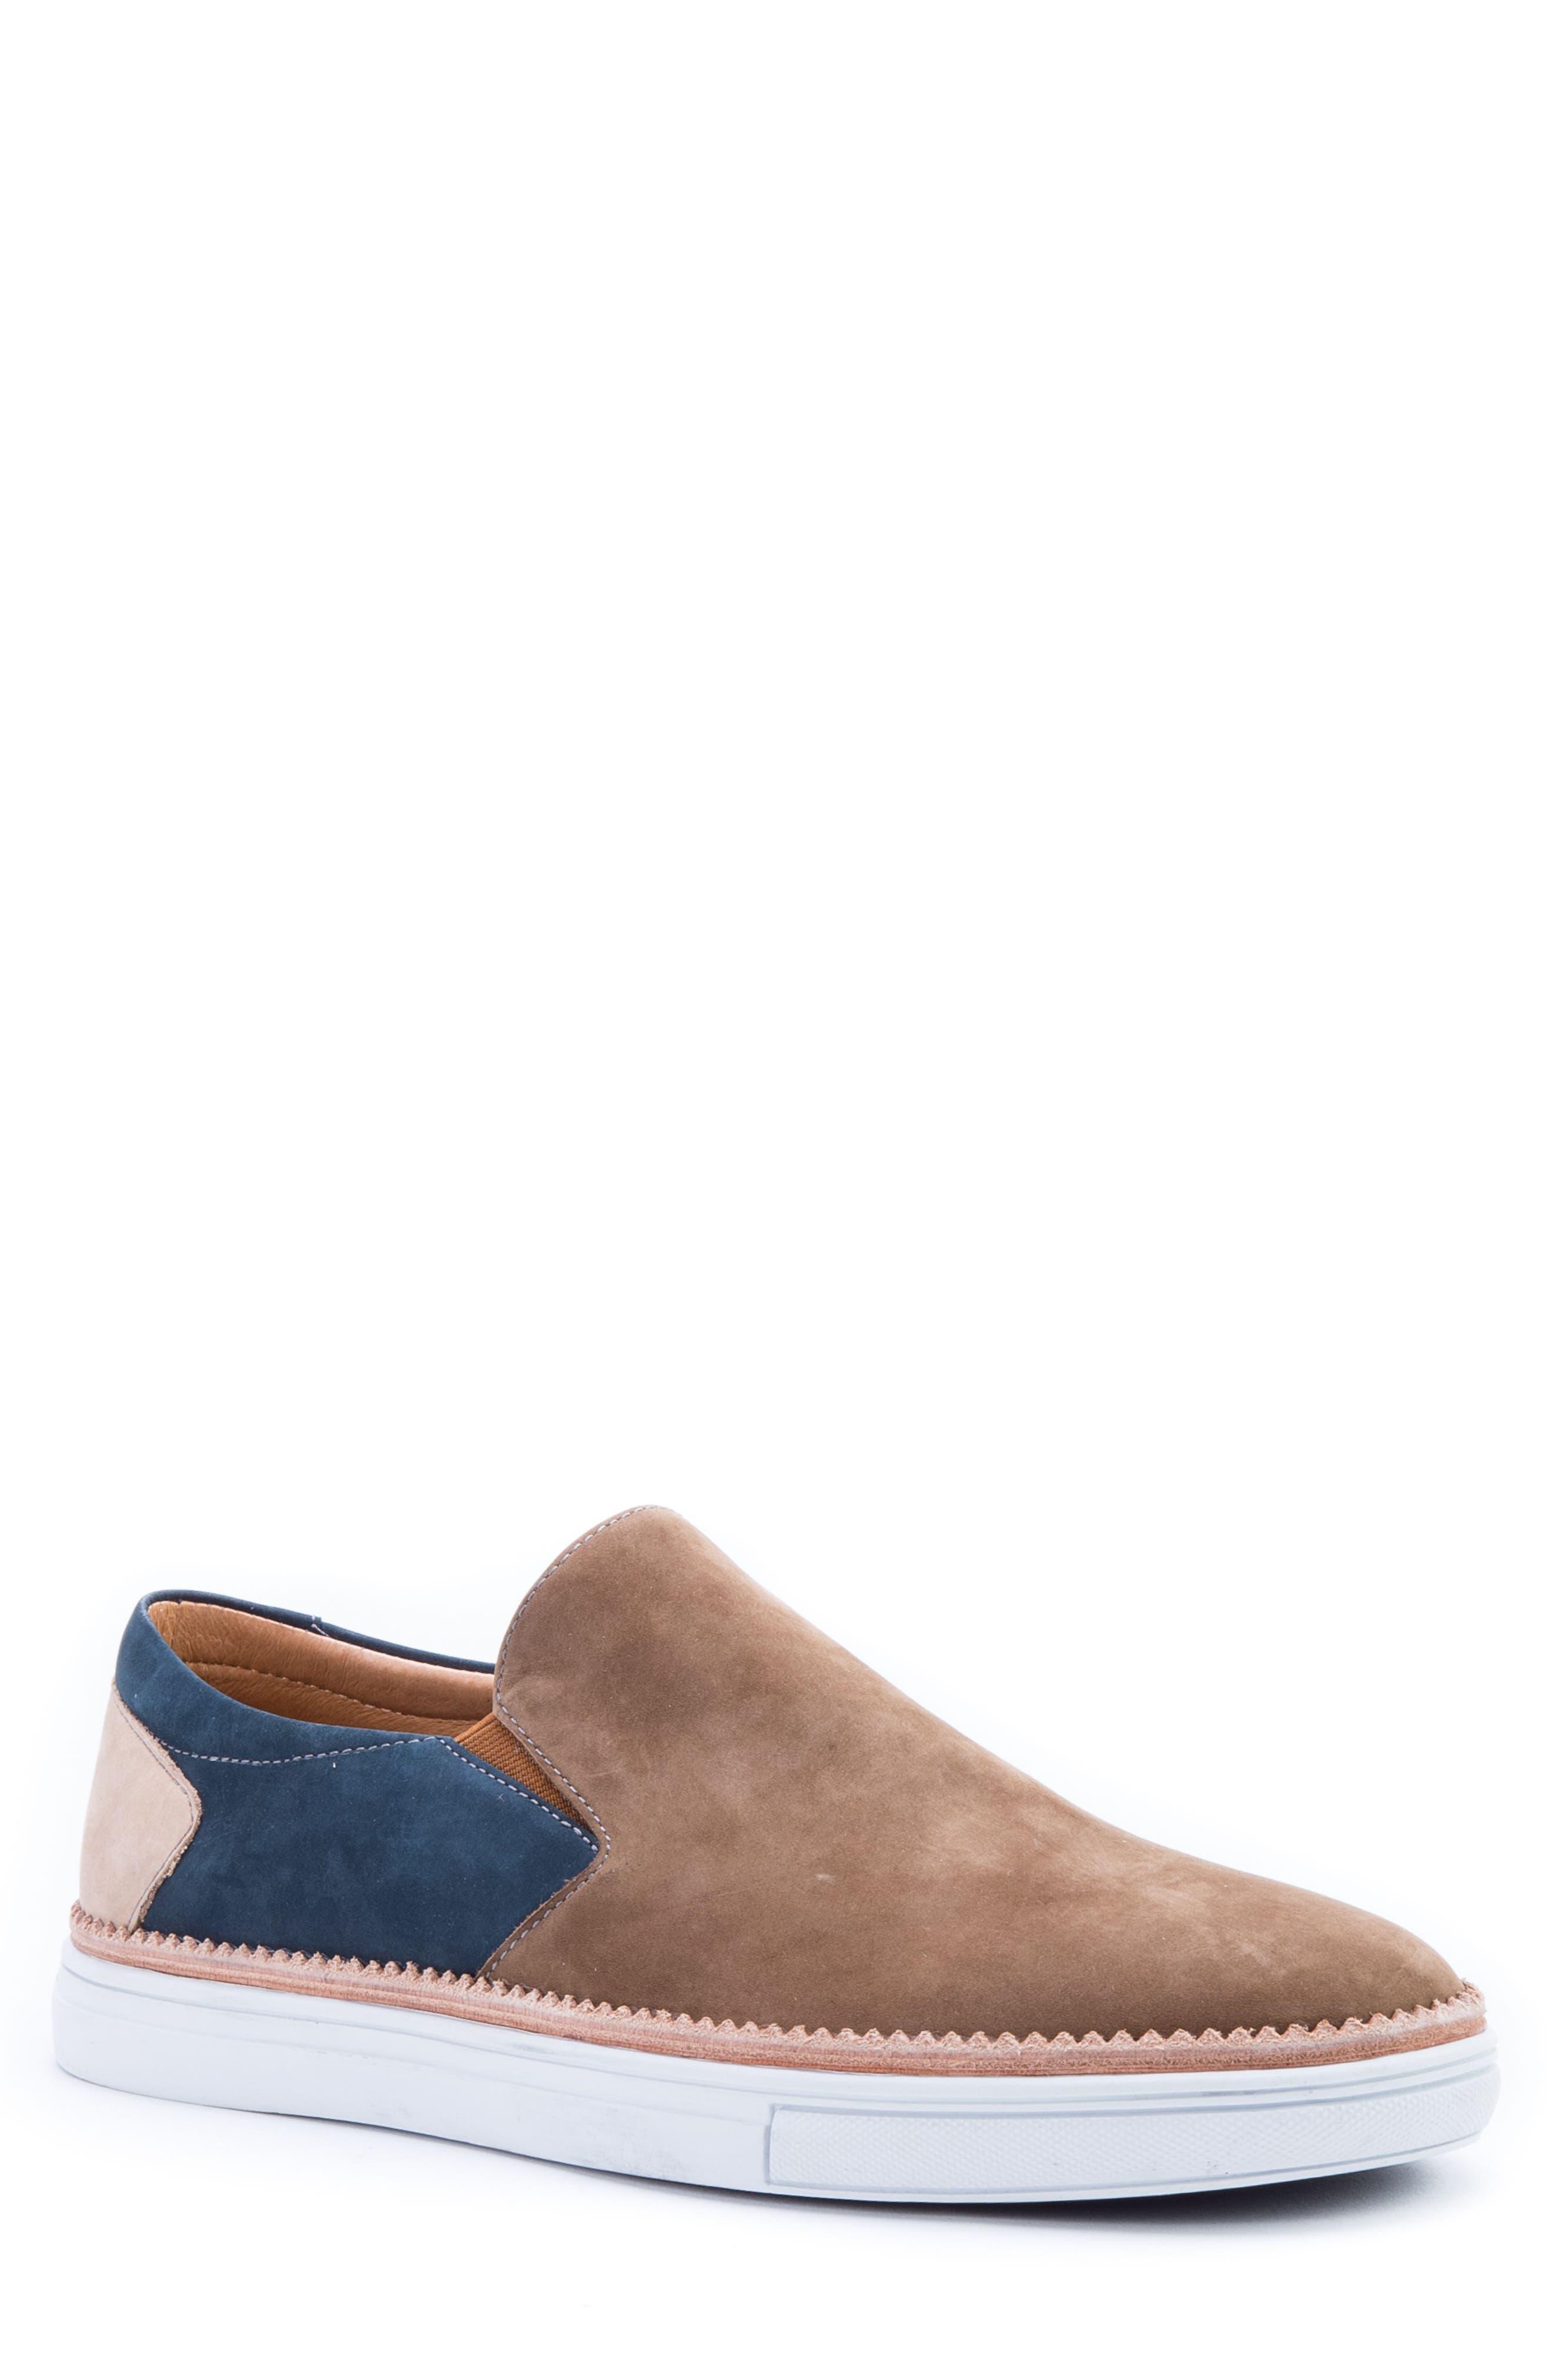 Rivera Colorblocked Slip-On Sneaker,                             Main thumbnail 1, color,                             COGNAC SUEDE